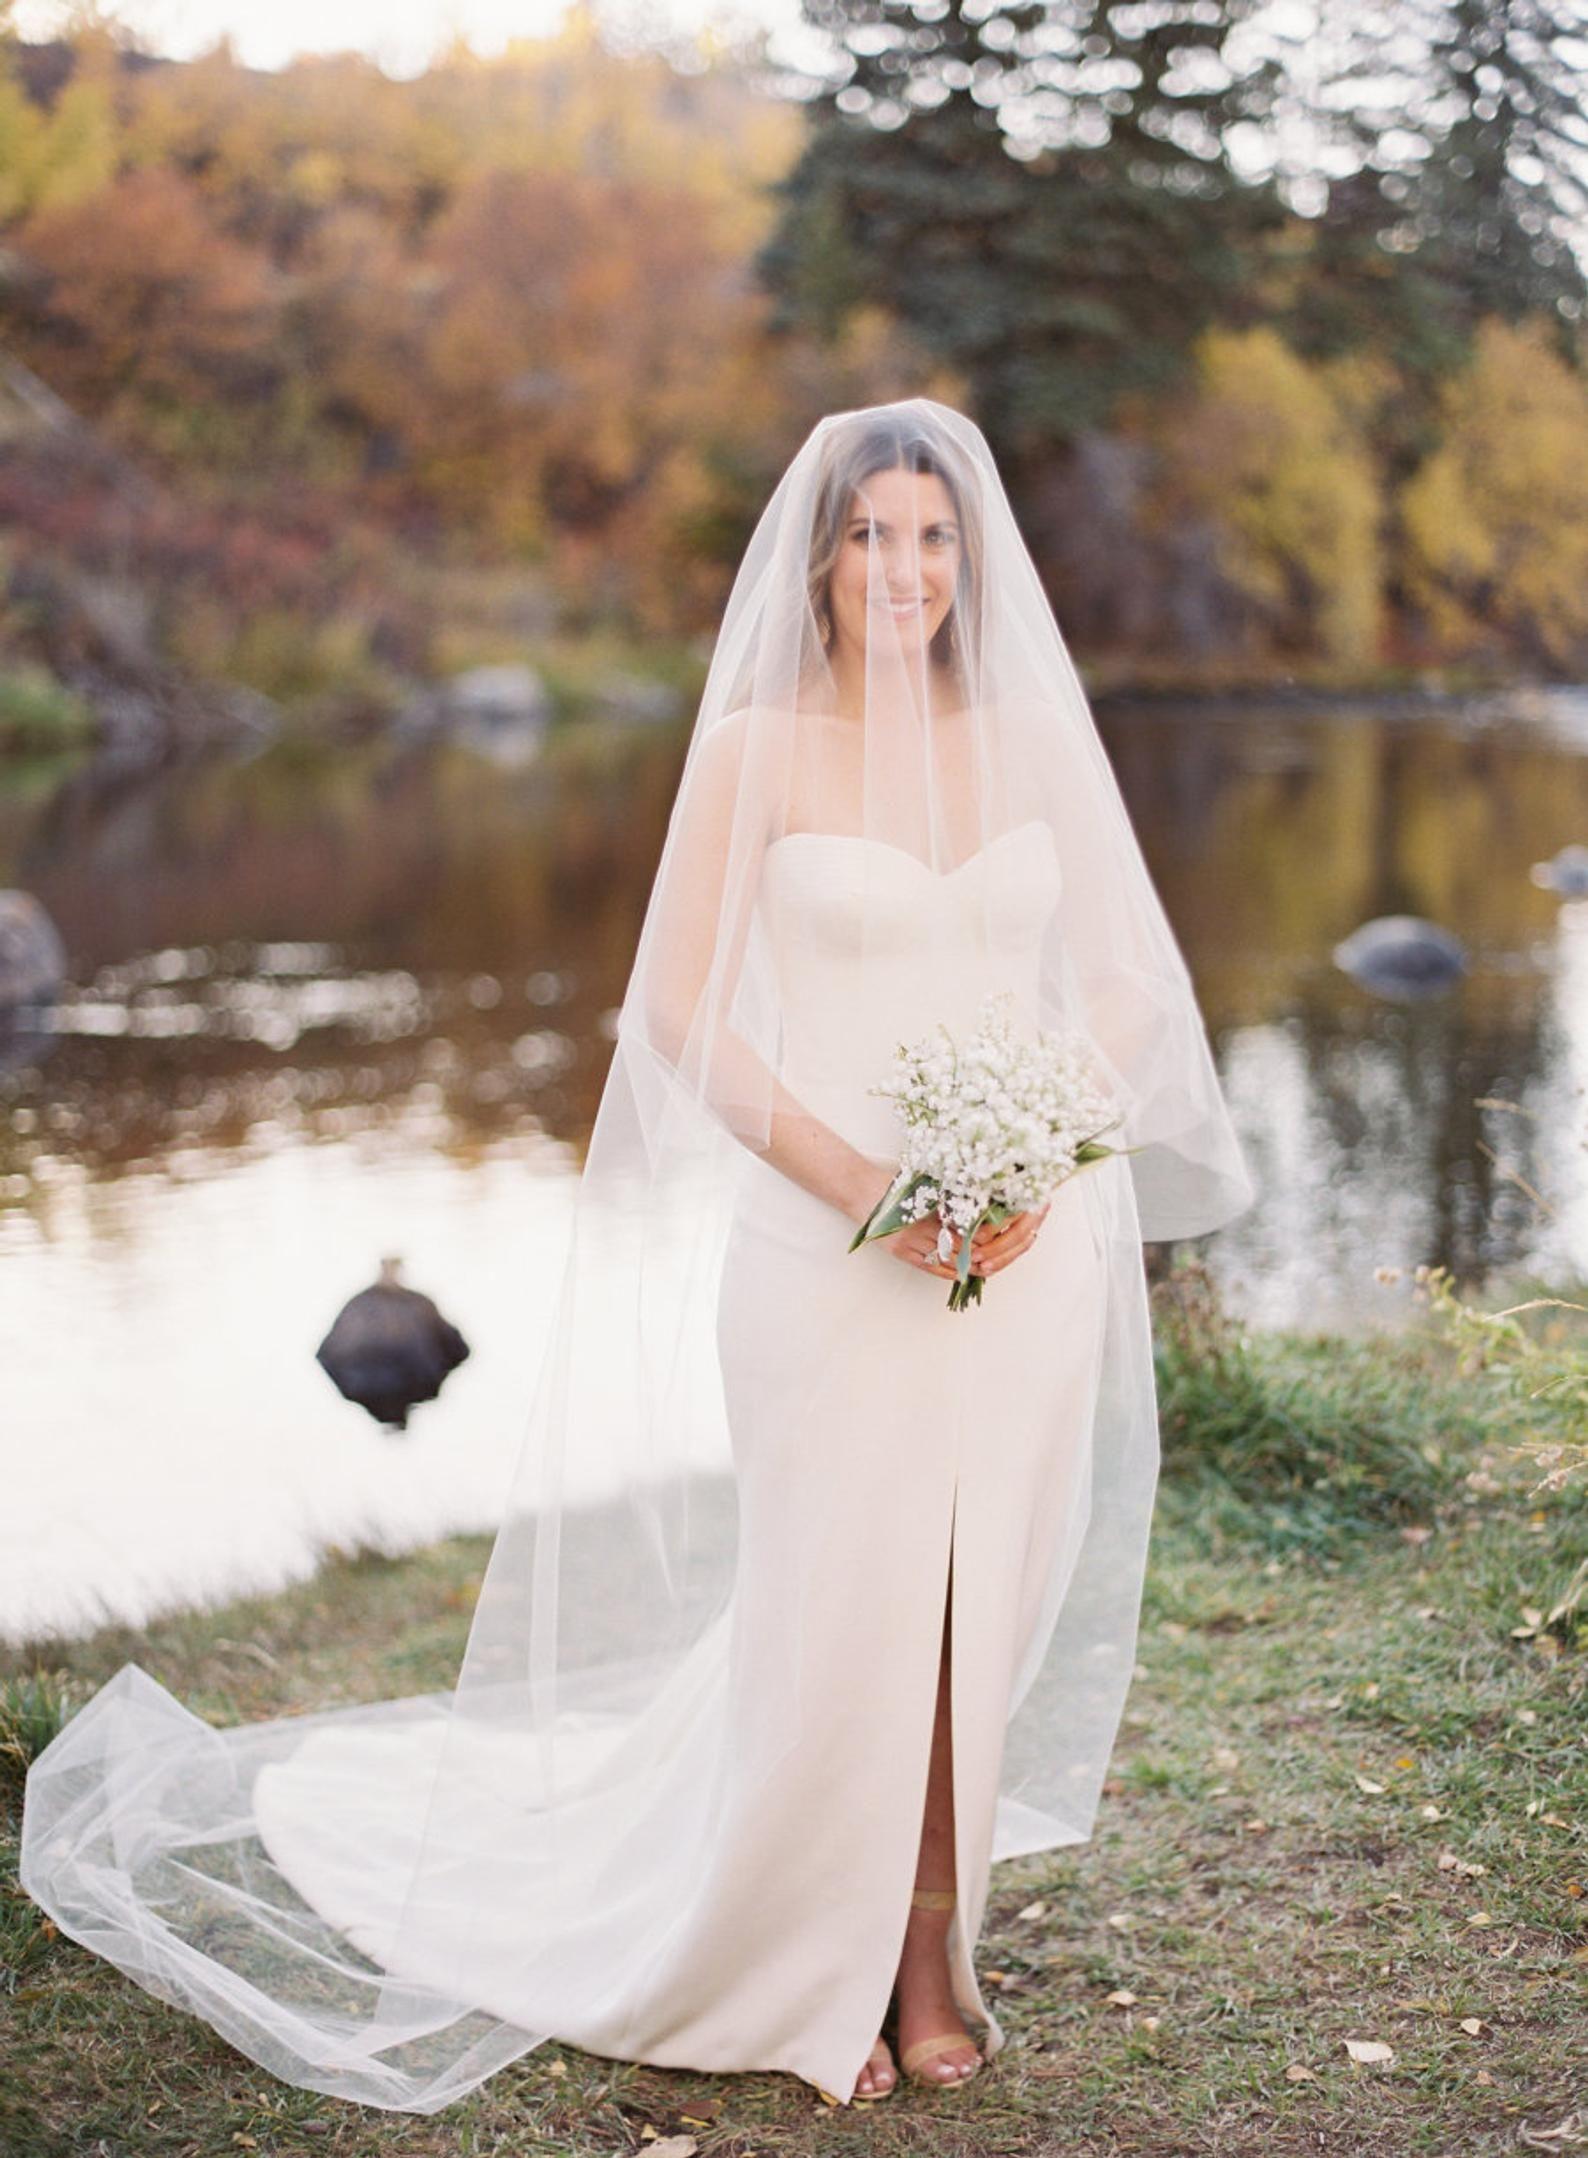 Pin By Michele Toney On Wedding Ivory Bridal Veil Ivory Bridal Wedding Bridal Veils [ 2158 x 1588 Pixel ]